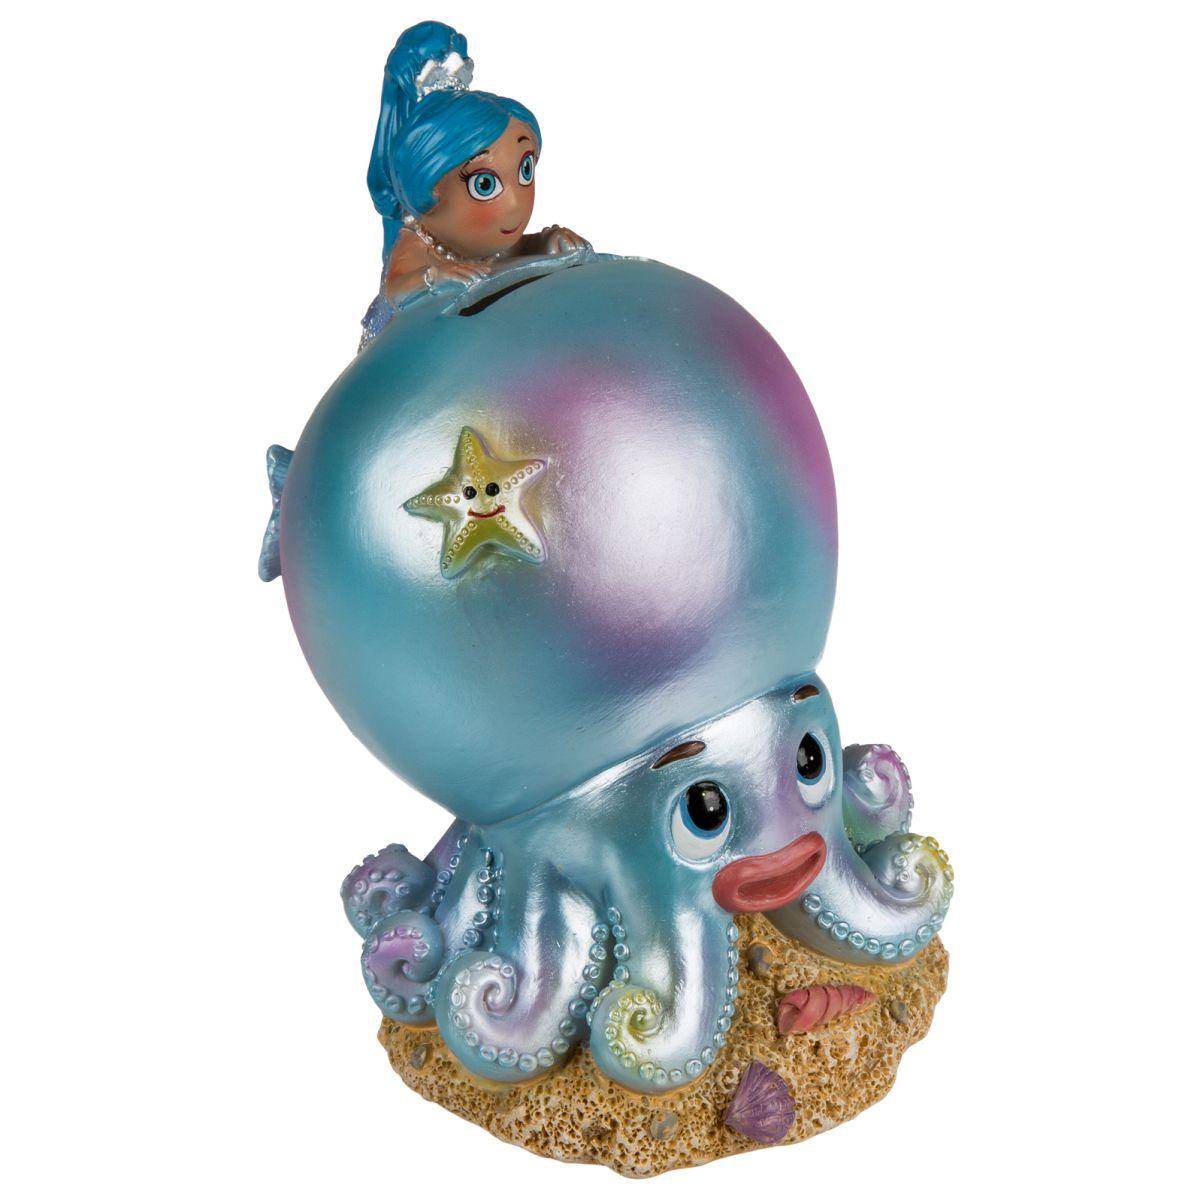 Spardose Meerjungfrau Auf Krake Blau